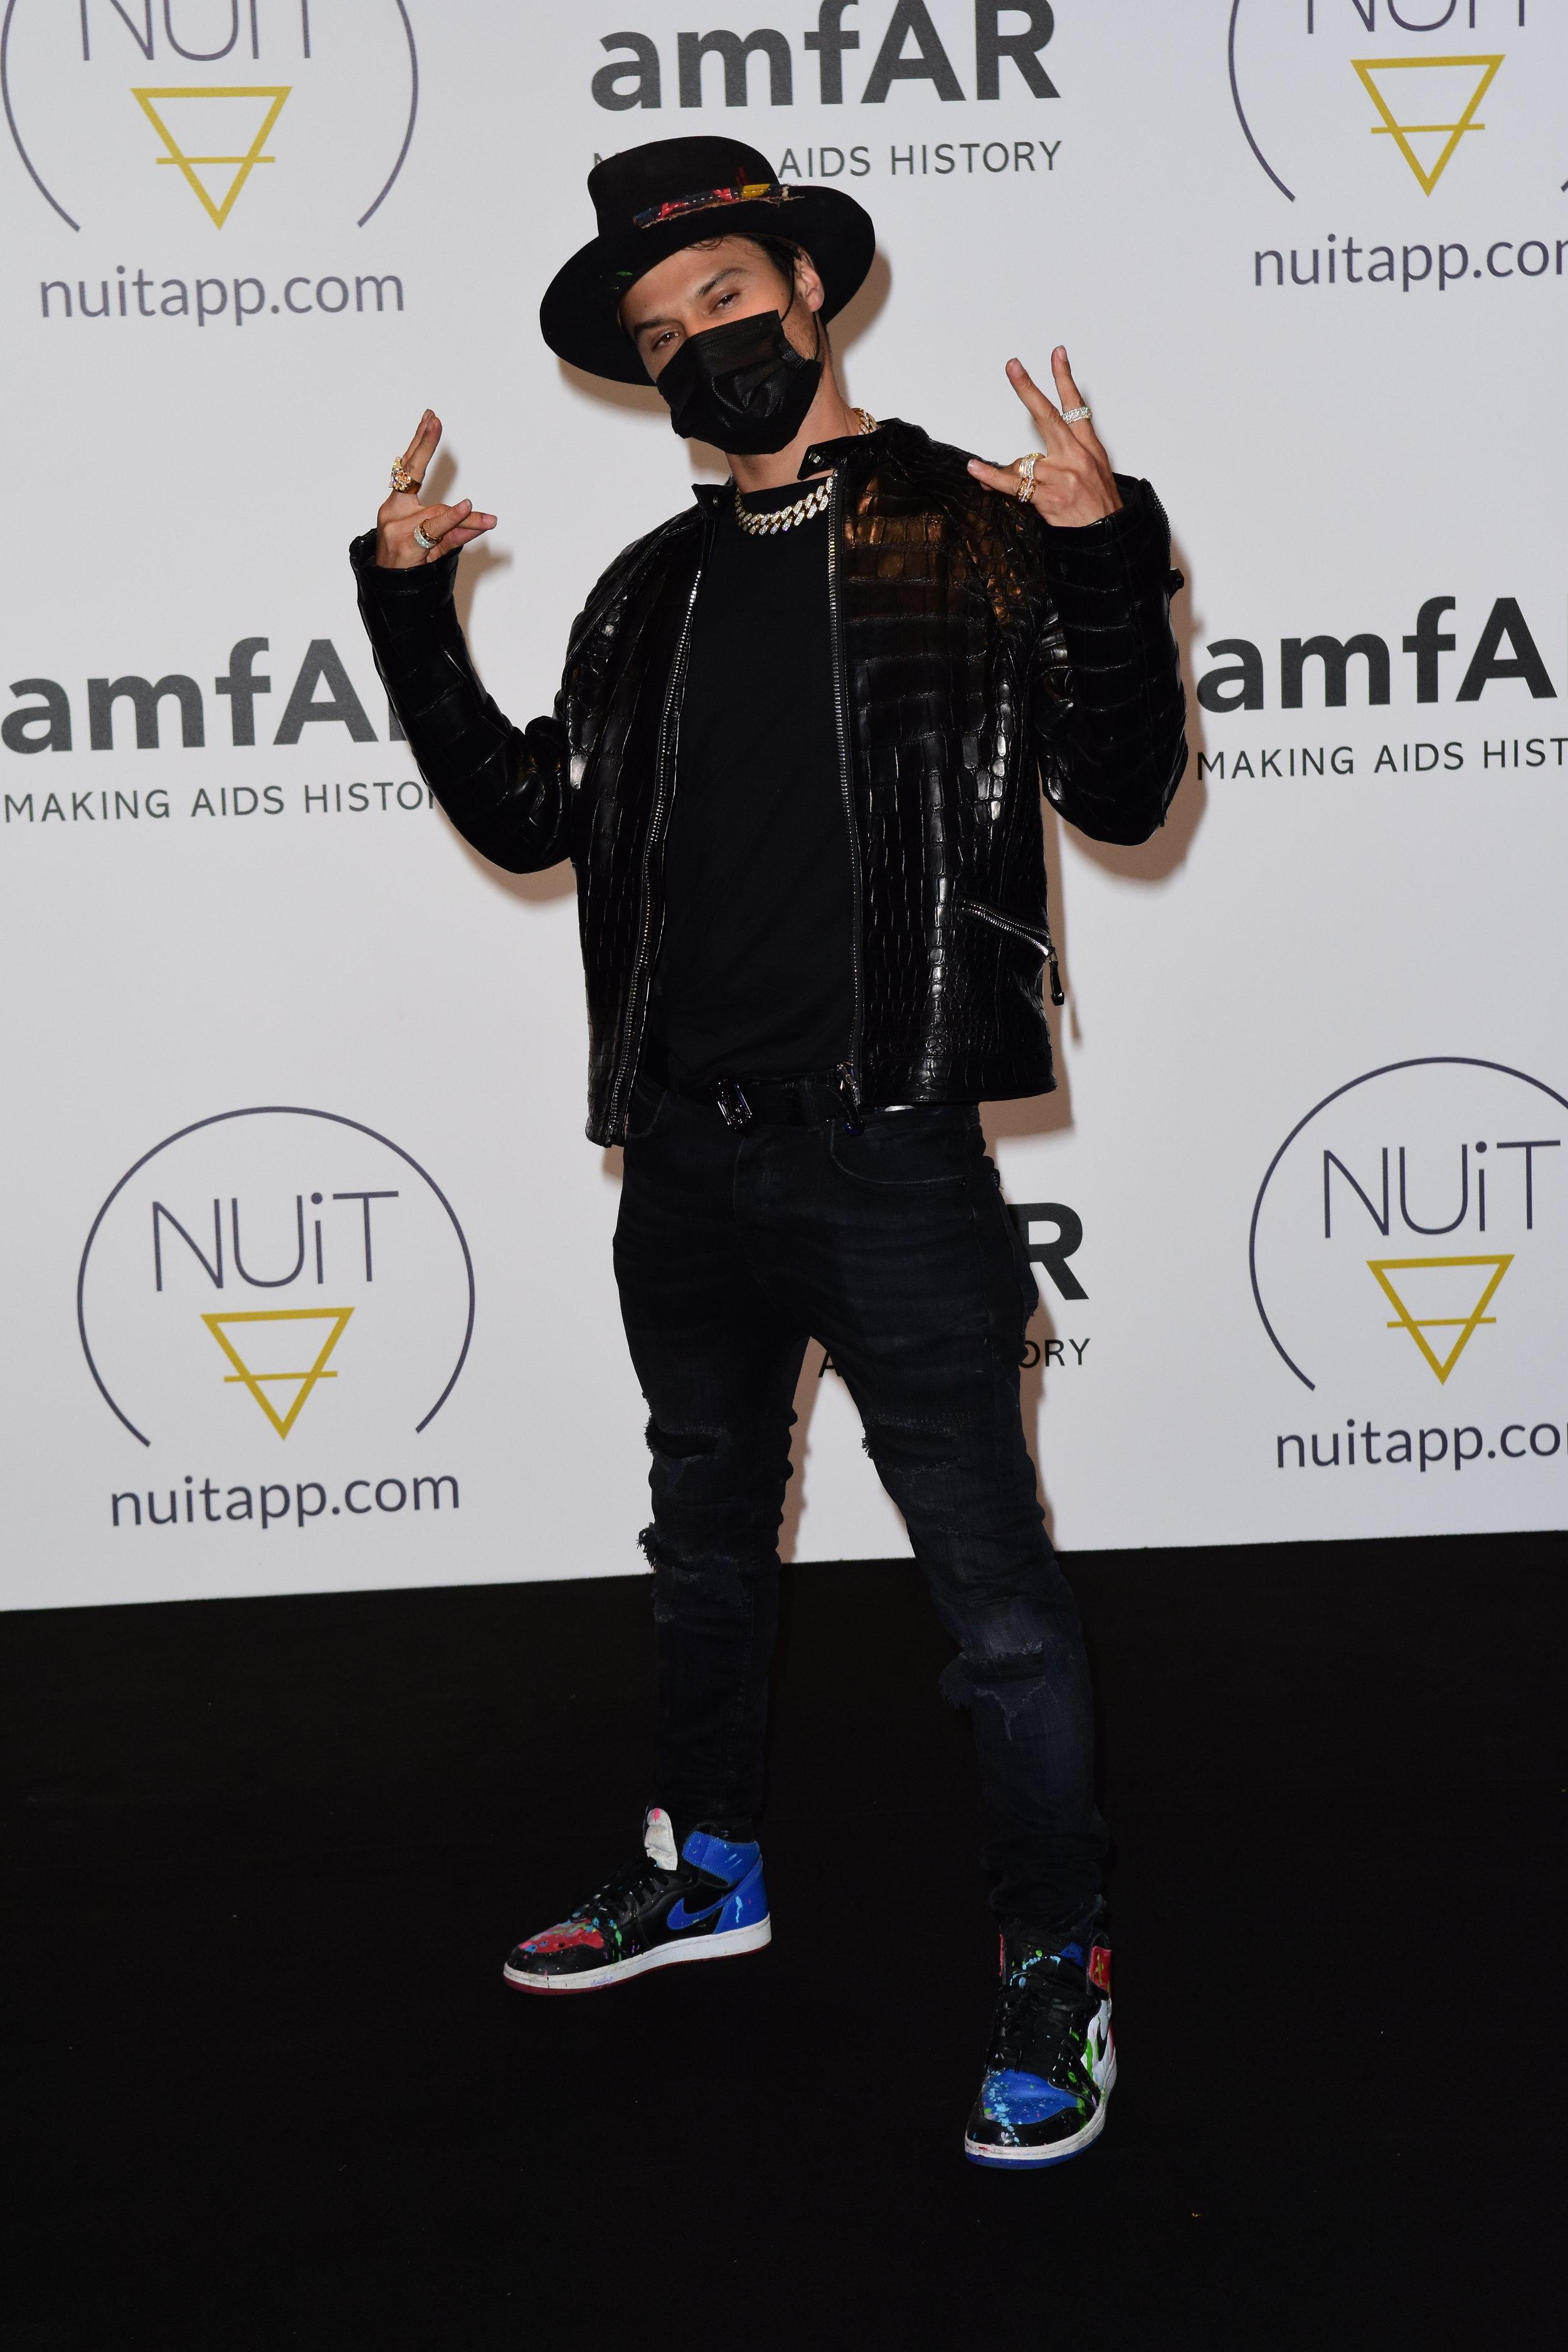 NUIT Pre Amfar party Cannes -copy- Joe Alvarez +447765678948 16500.JPG